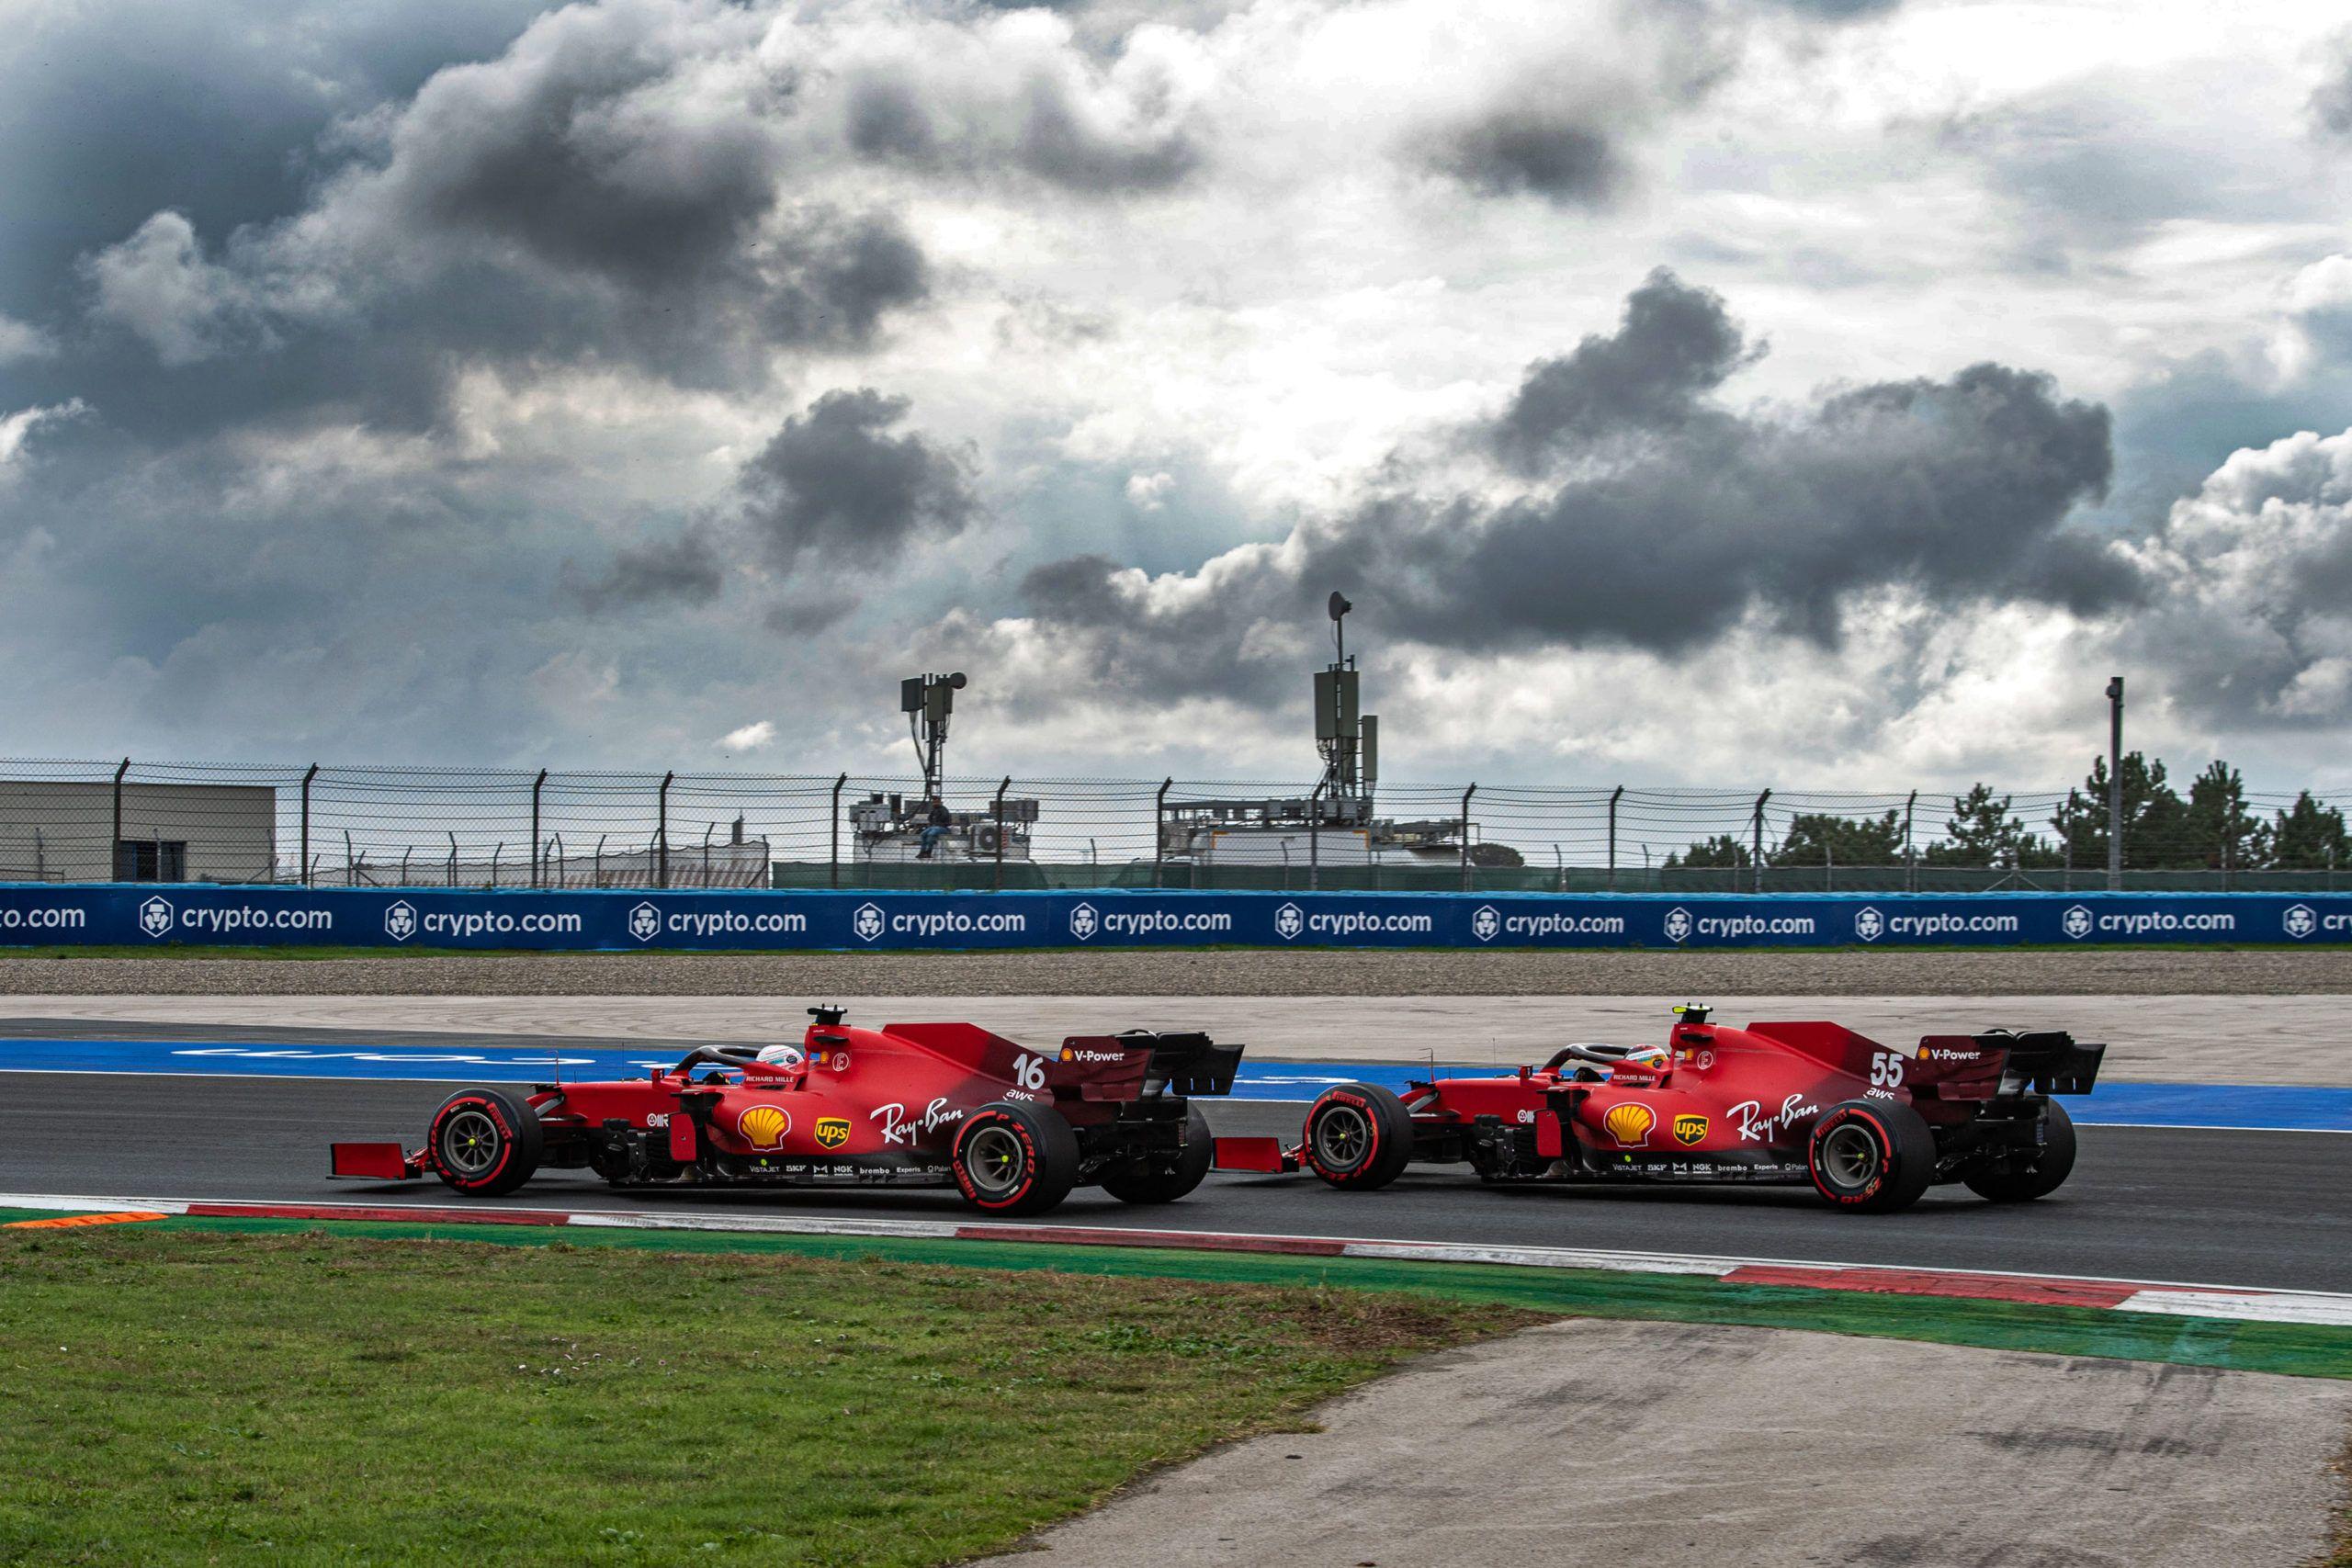 Carlos Sainz, Charles Leclerc, Ferrari, Mattia Binotto